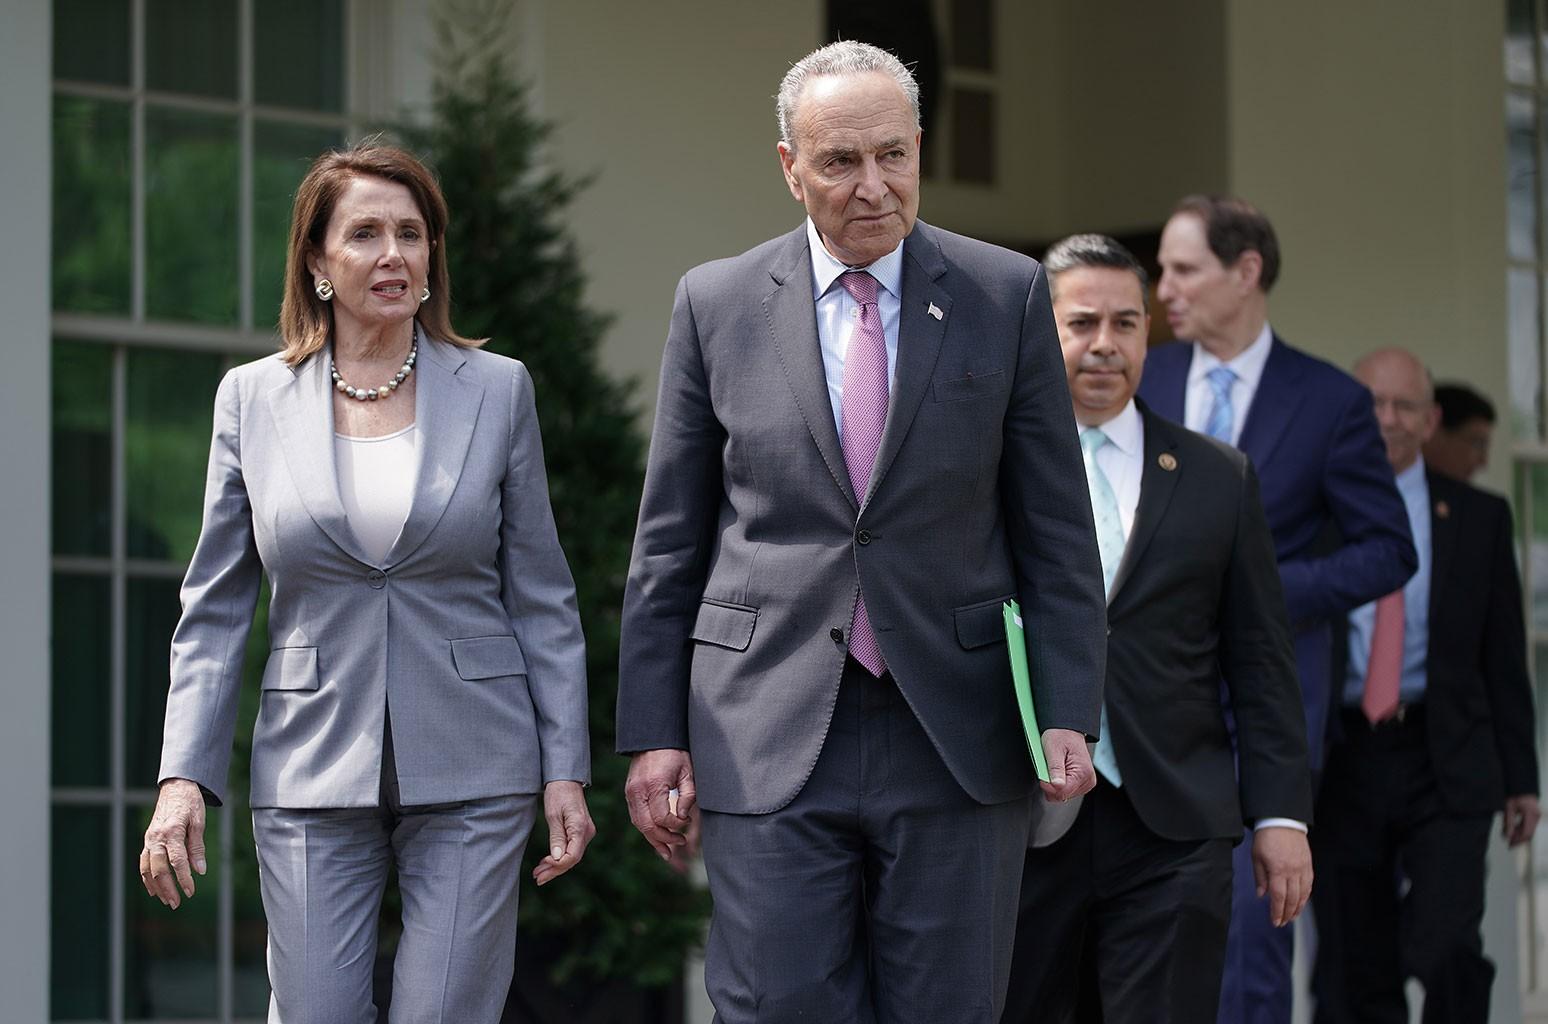 Nancy Pelosi, Charles Schumer